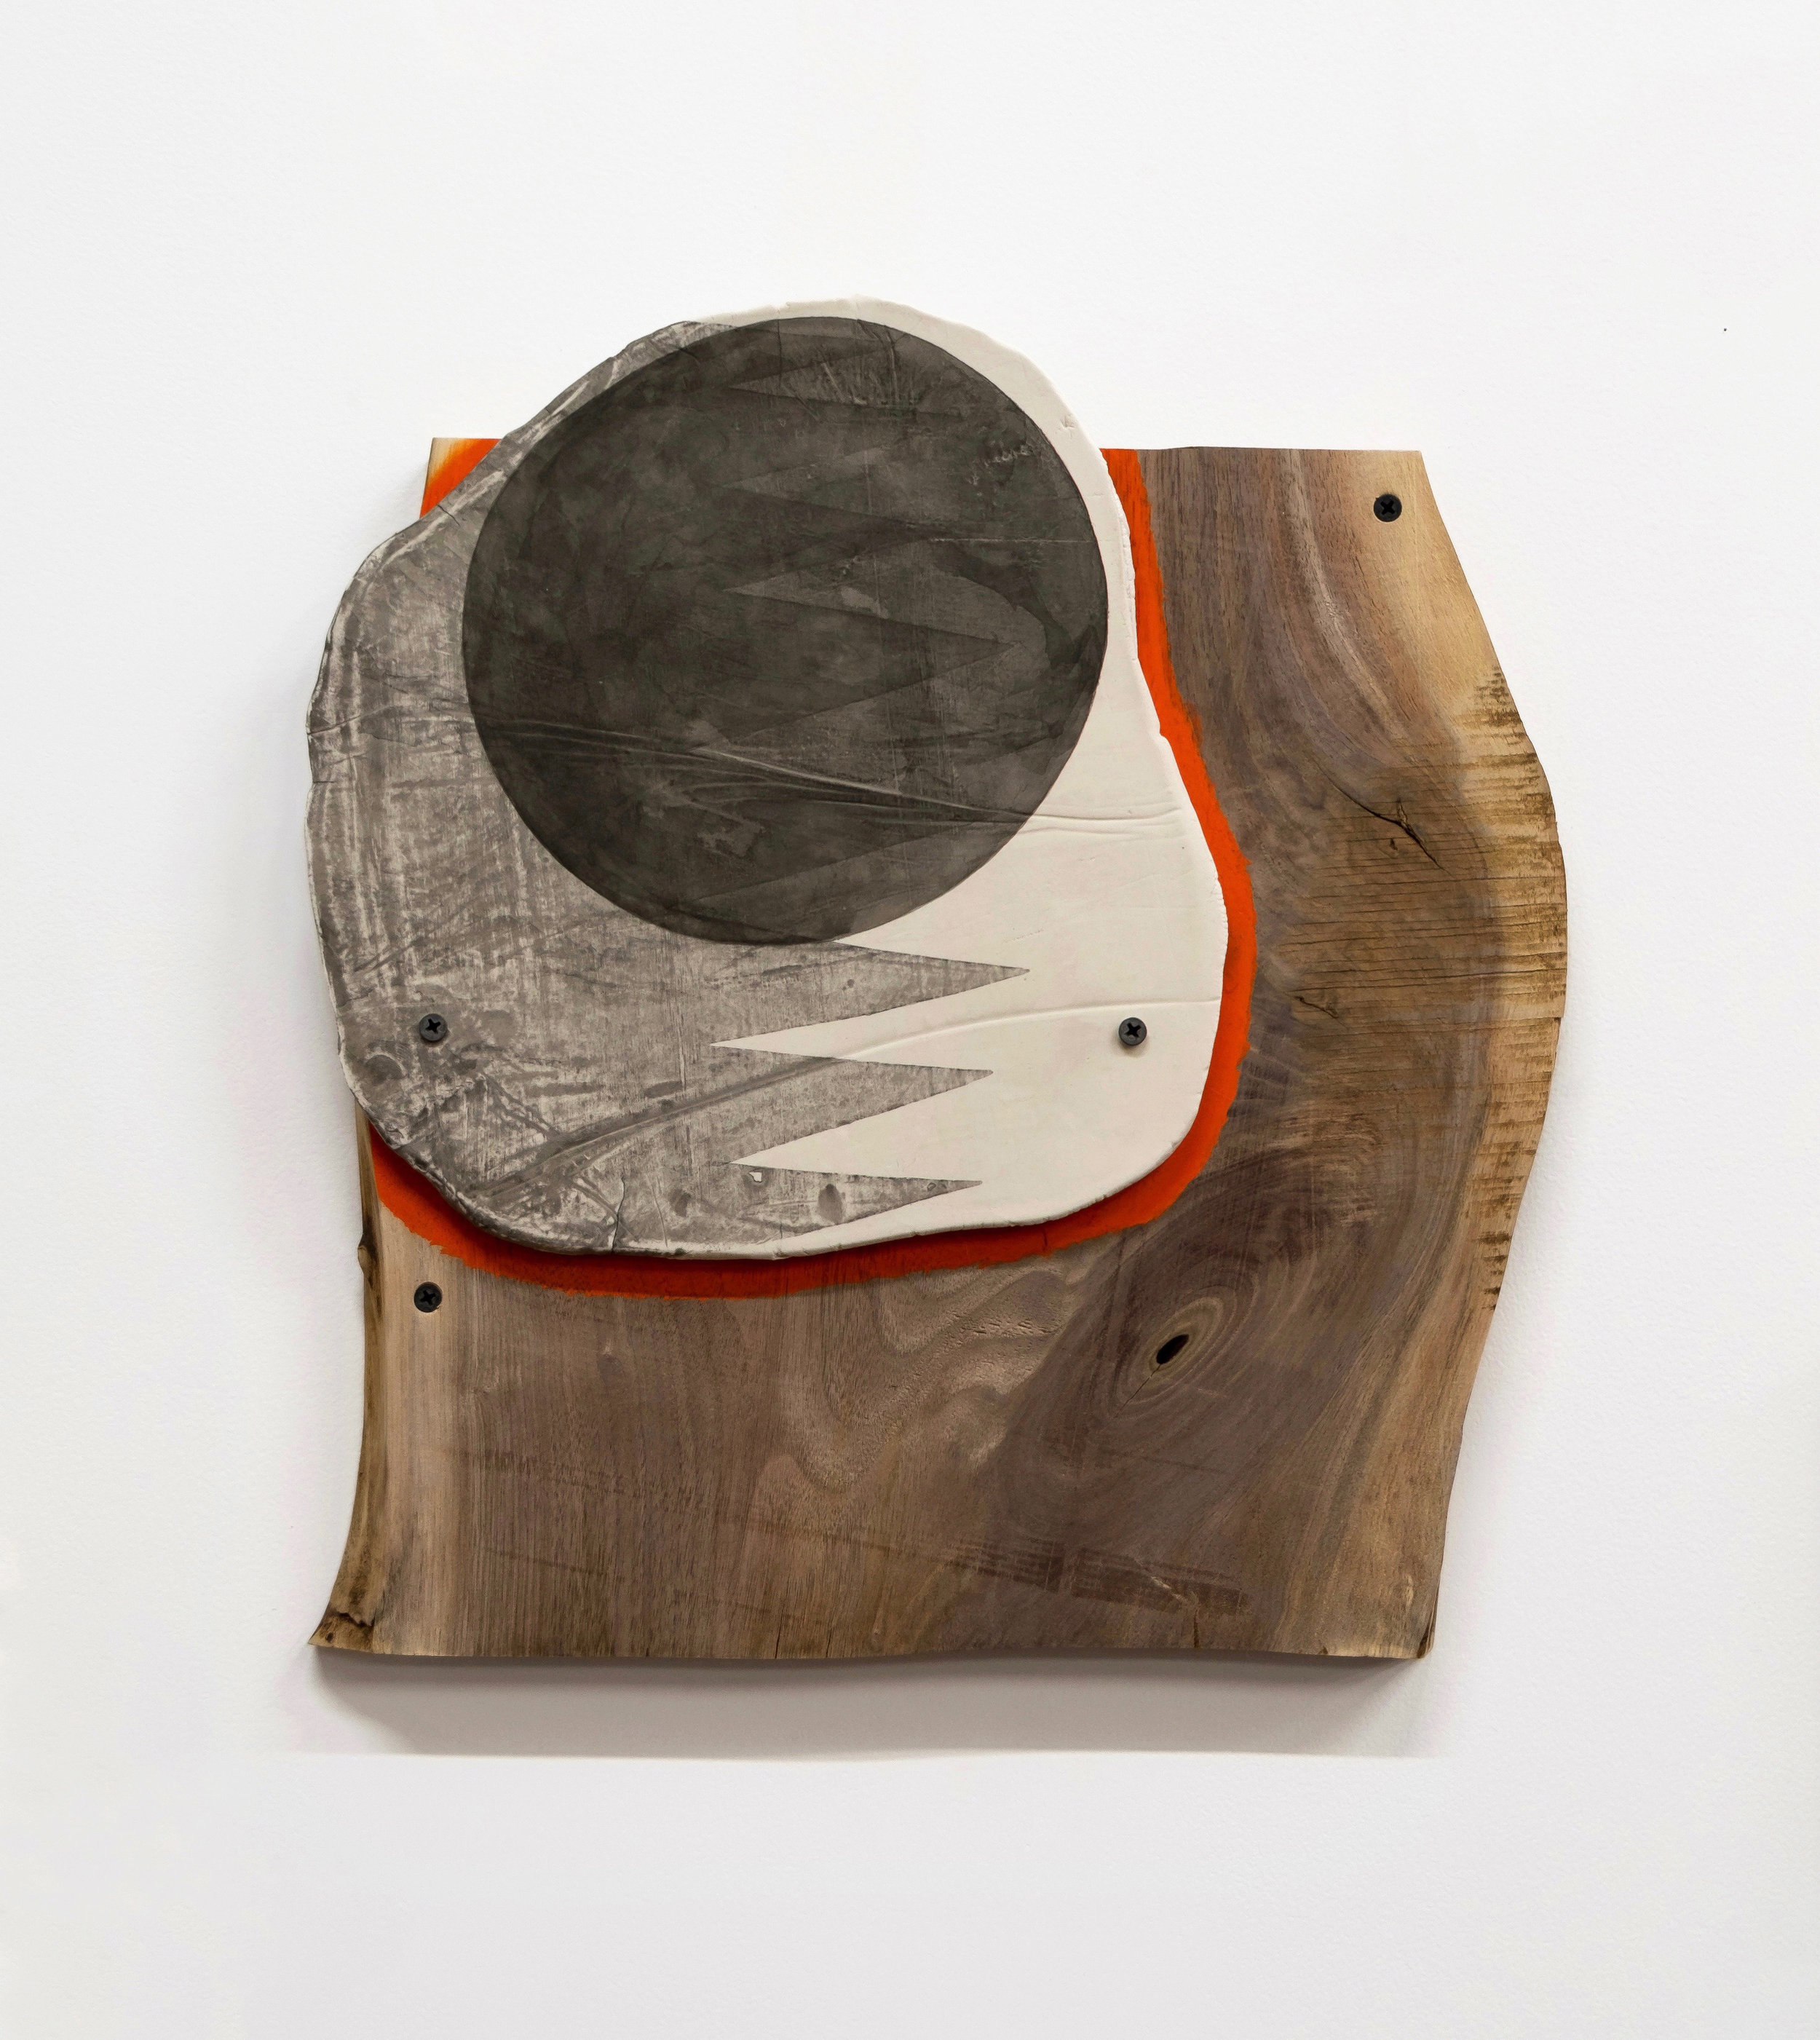 "Untitled, 2019, porcelain, ink, wood, screws, 15 x 15-3/4 x 1-1/4"""